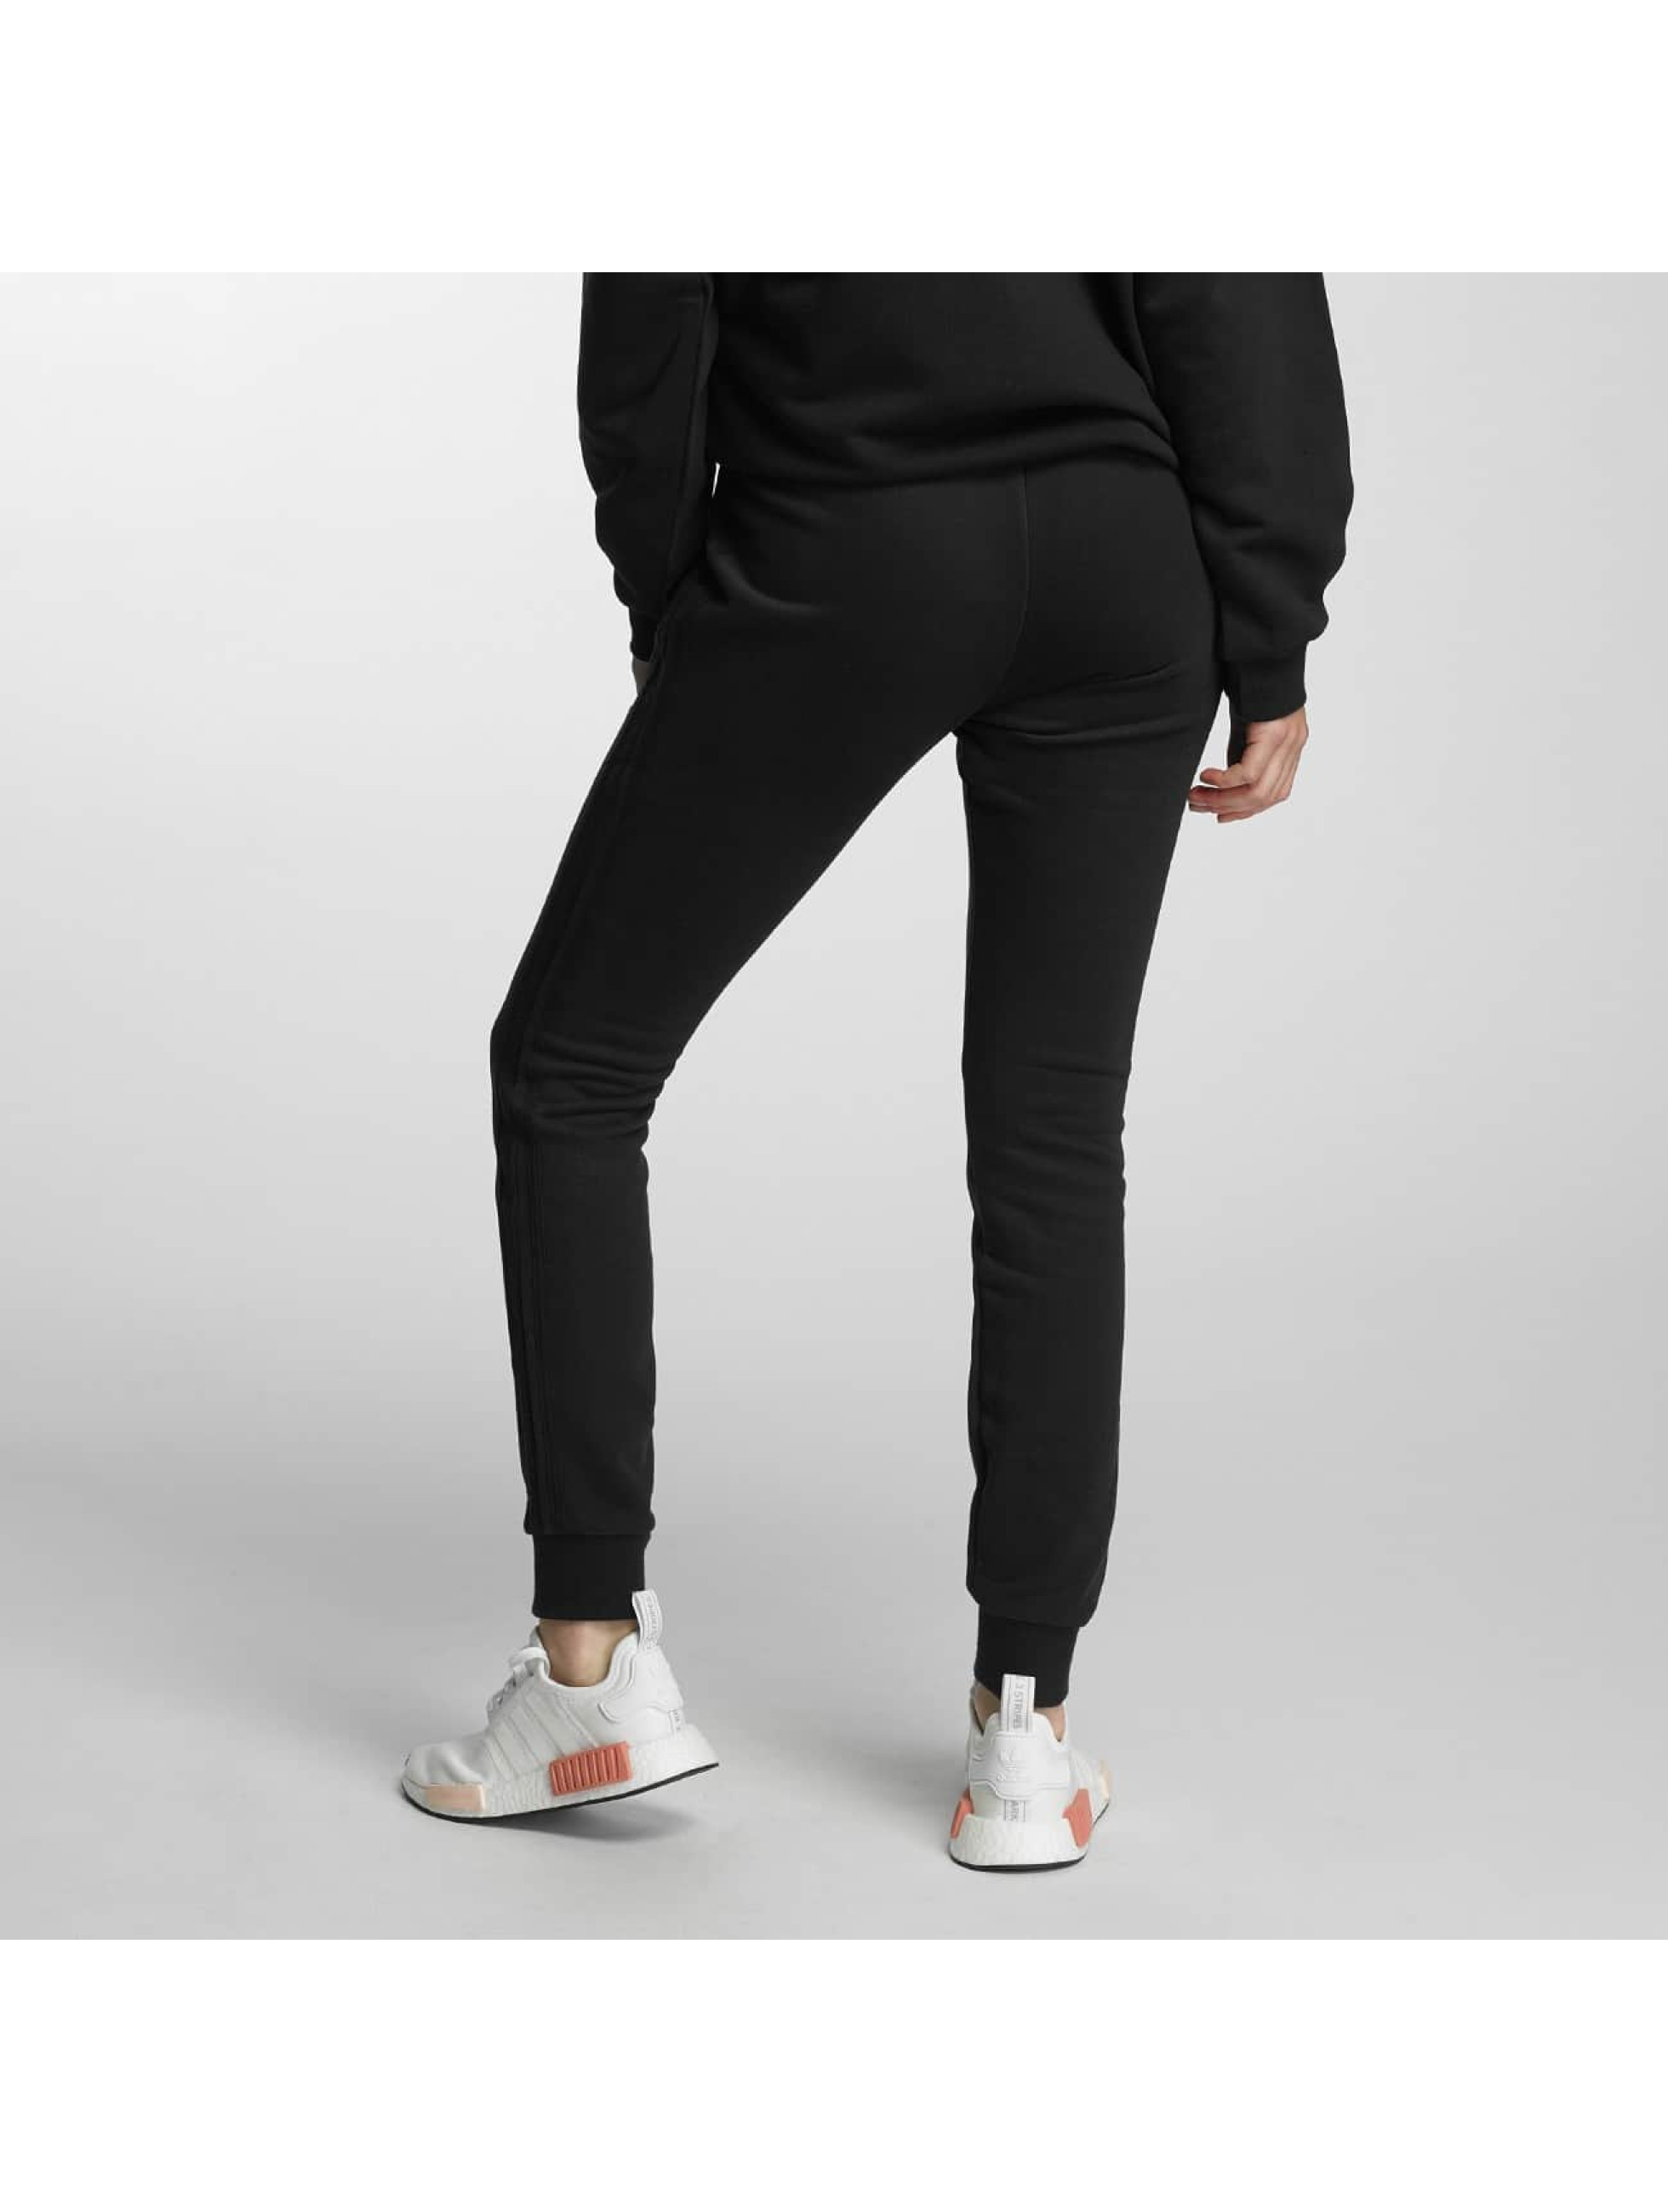 adidas originals Spodnie do joggingu Slim Cut czarny